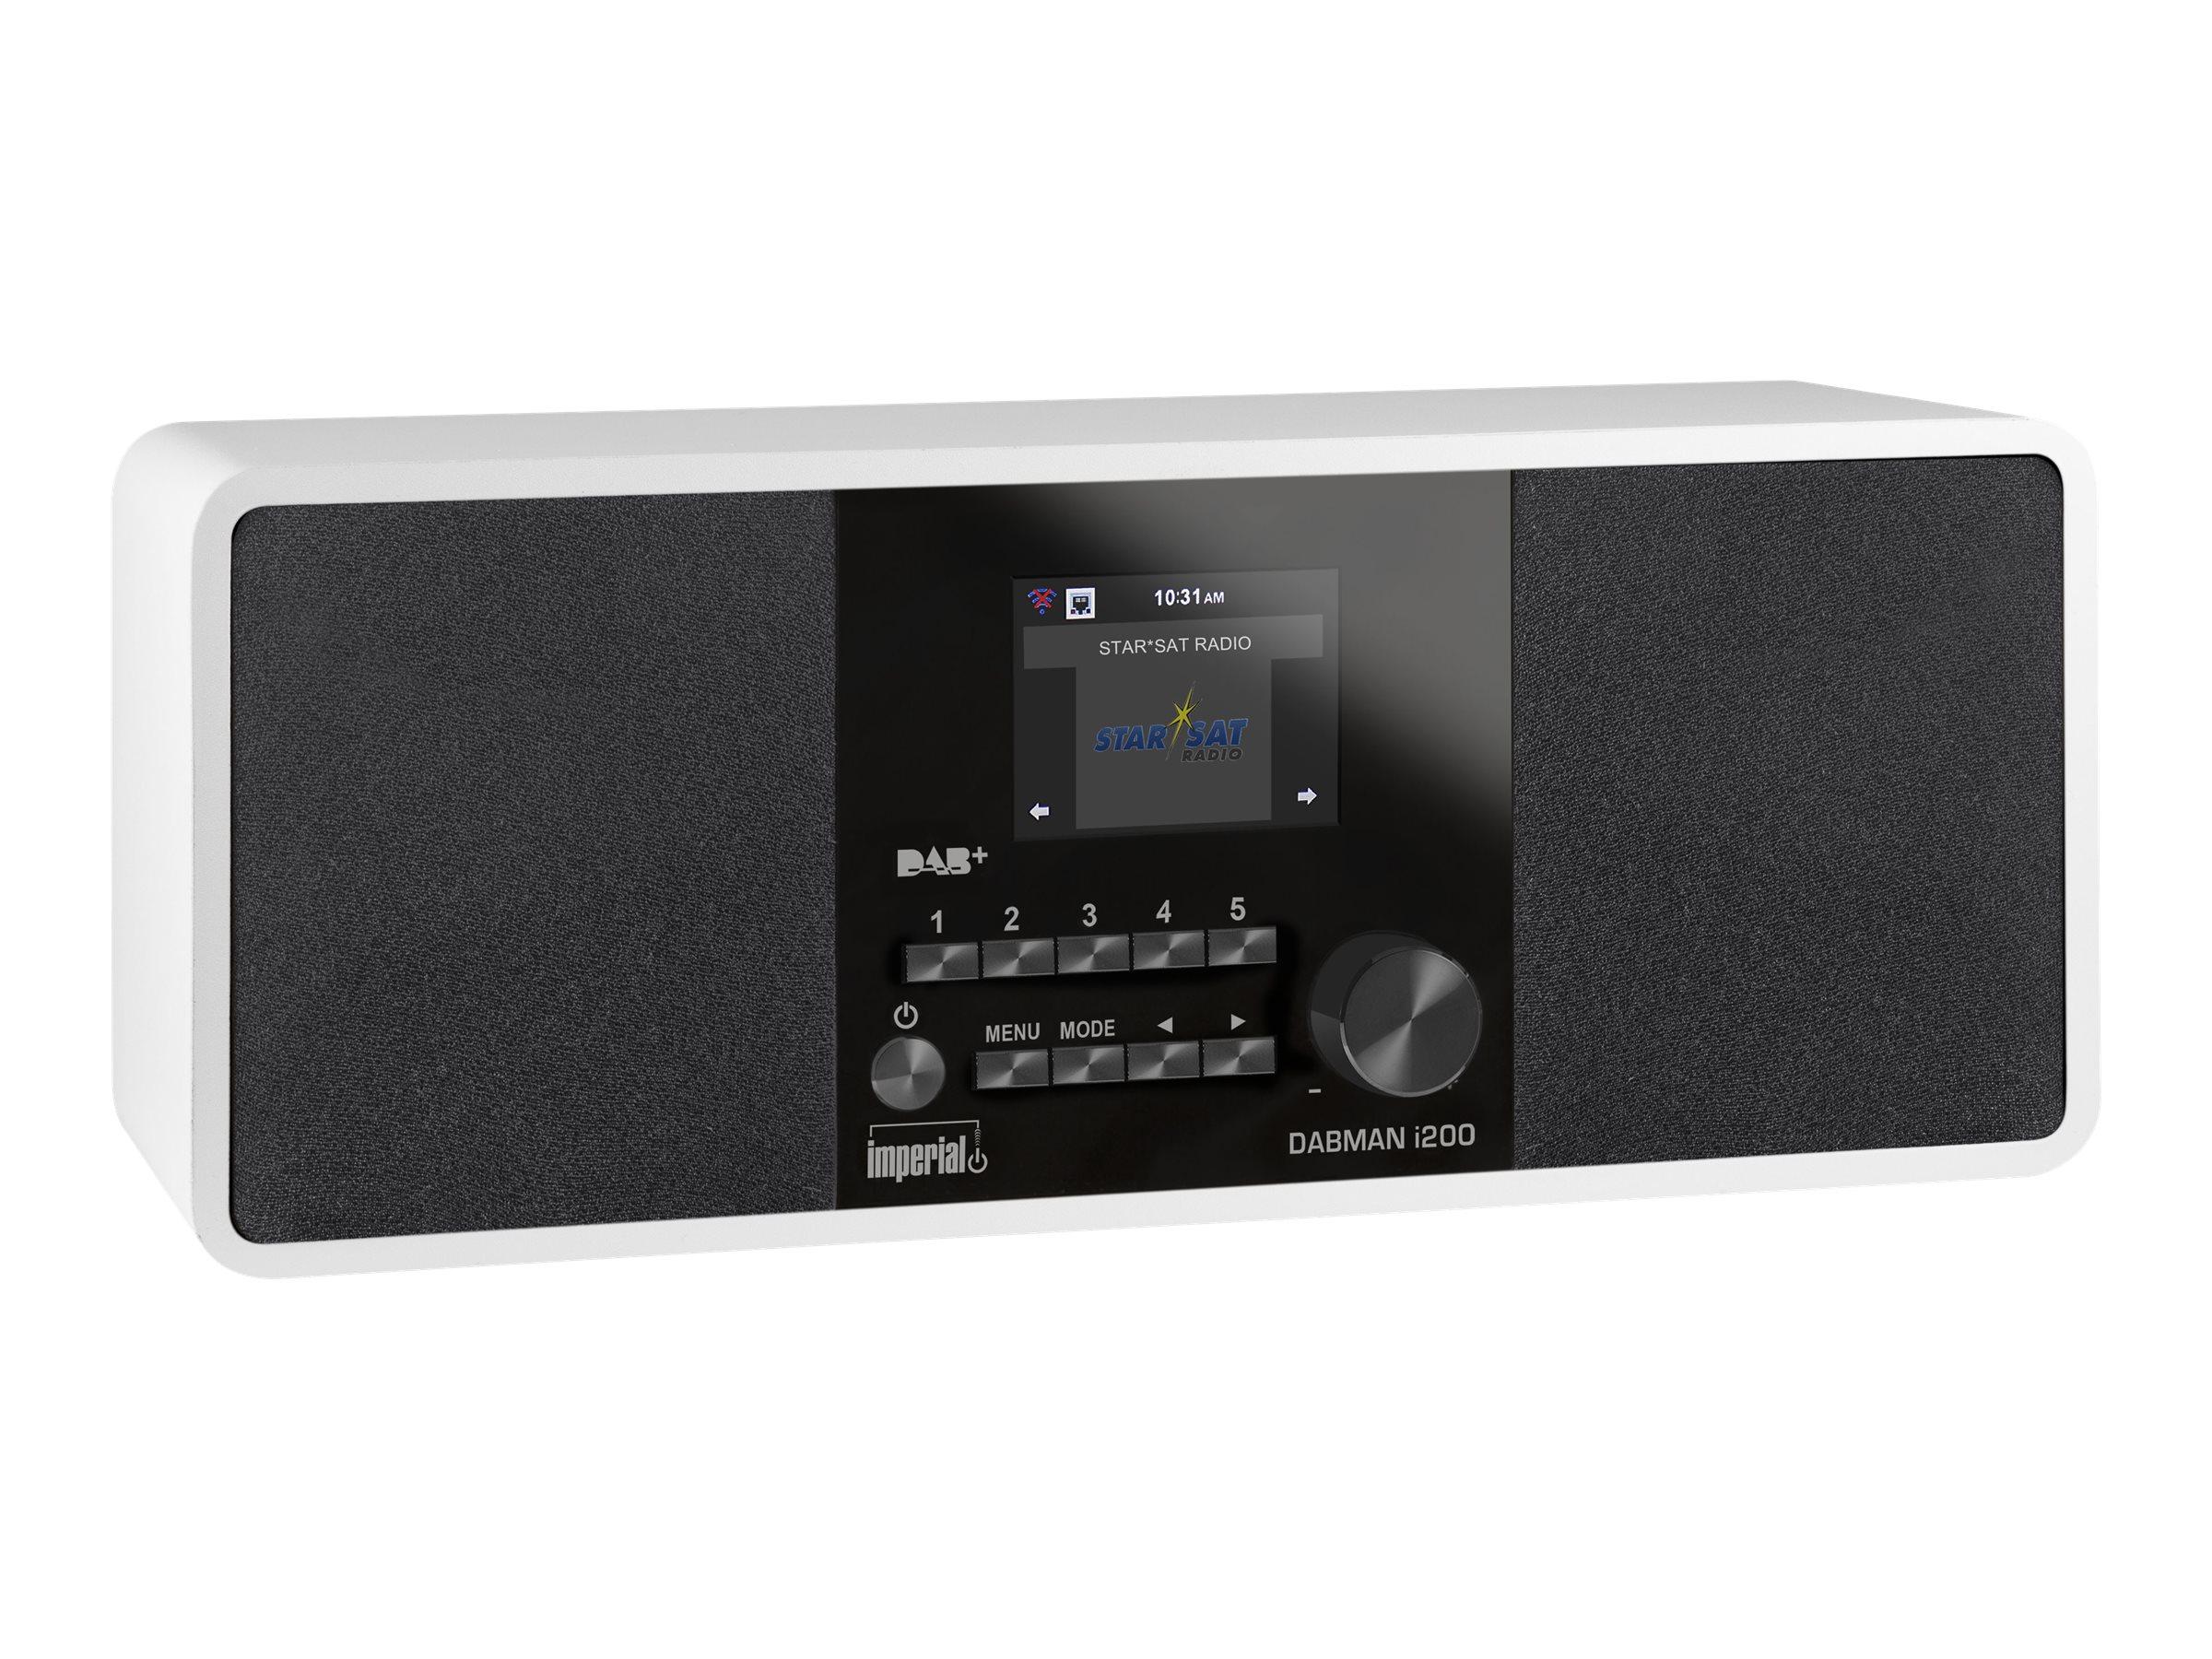 Telestar imperial DABMAN i200 - Netzwerk-Audio-Player - 20 Watt (Gesamt)